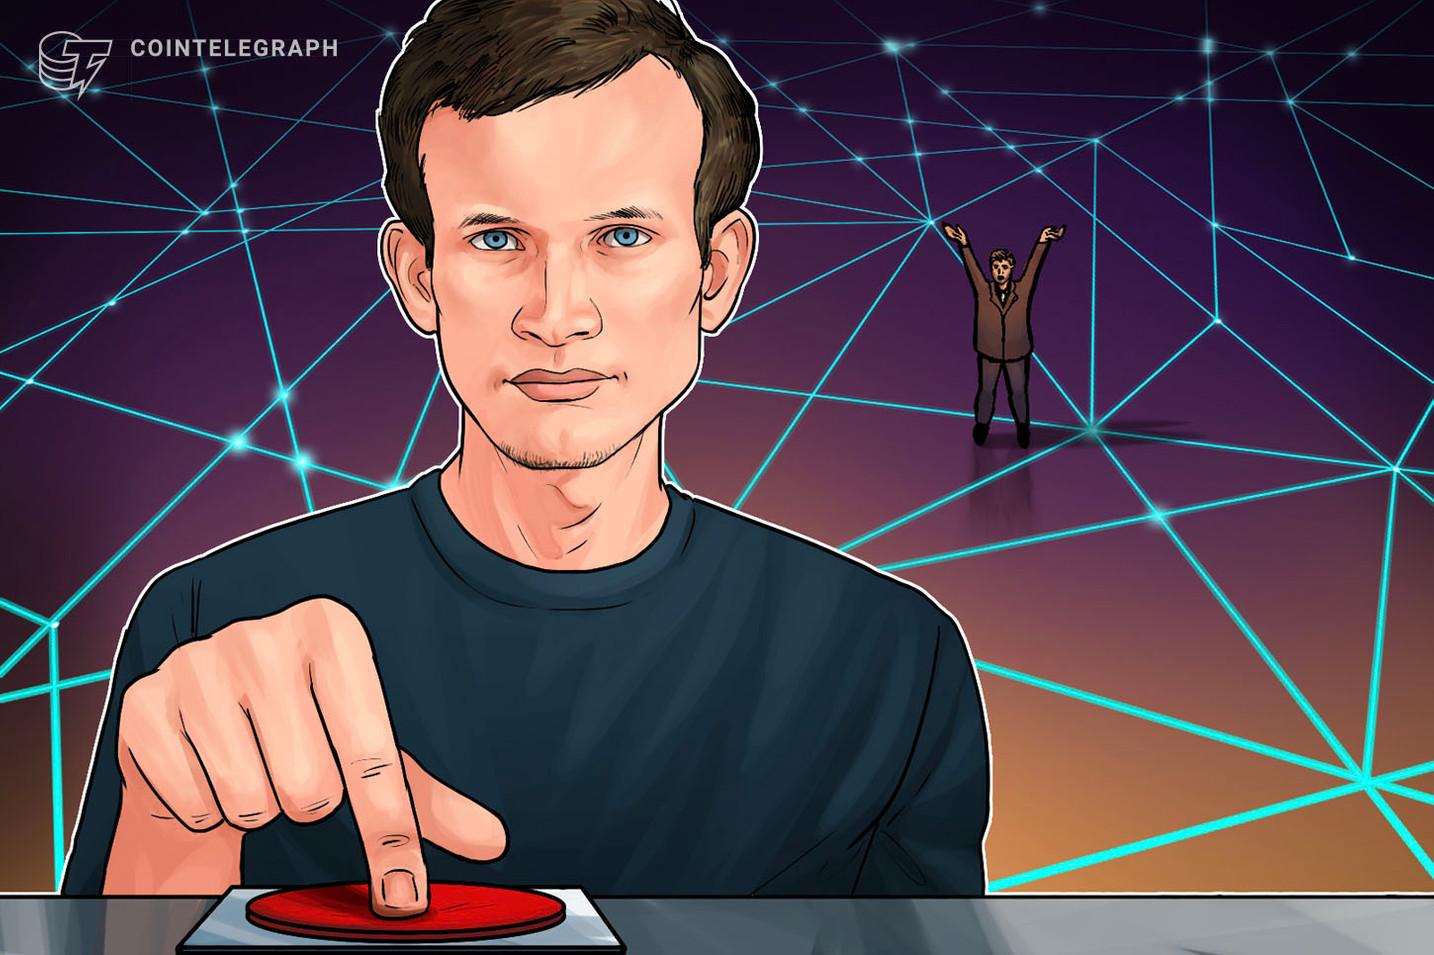 Vitalik Buterin Blockchain Patentleri Konusunda Craig Wright'a Laf Attı